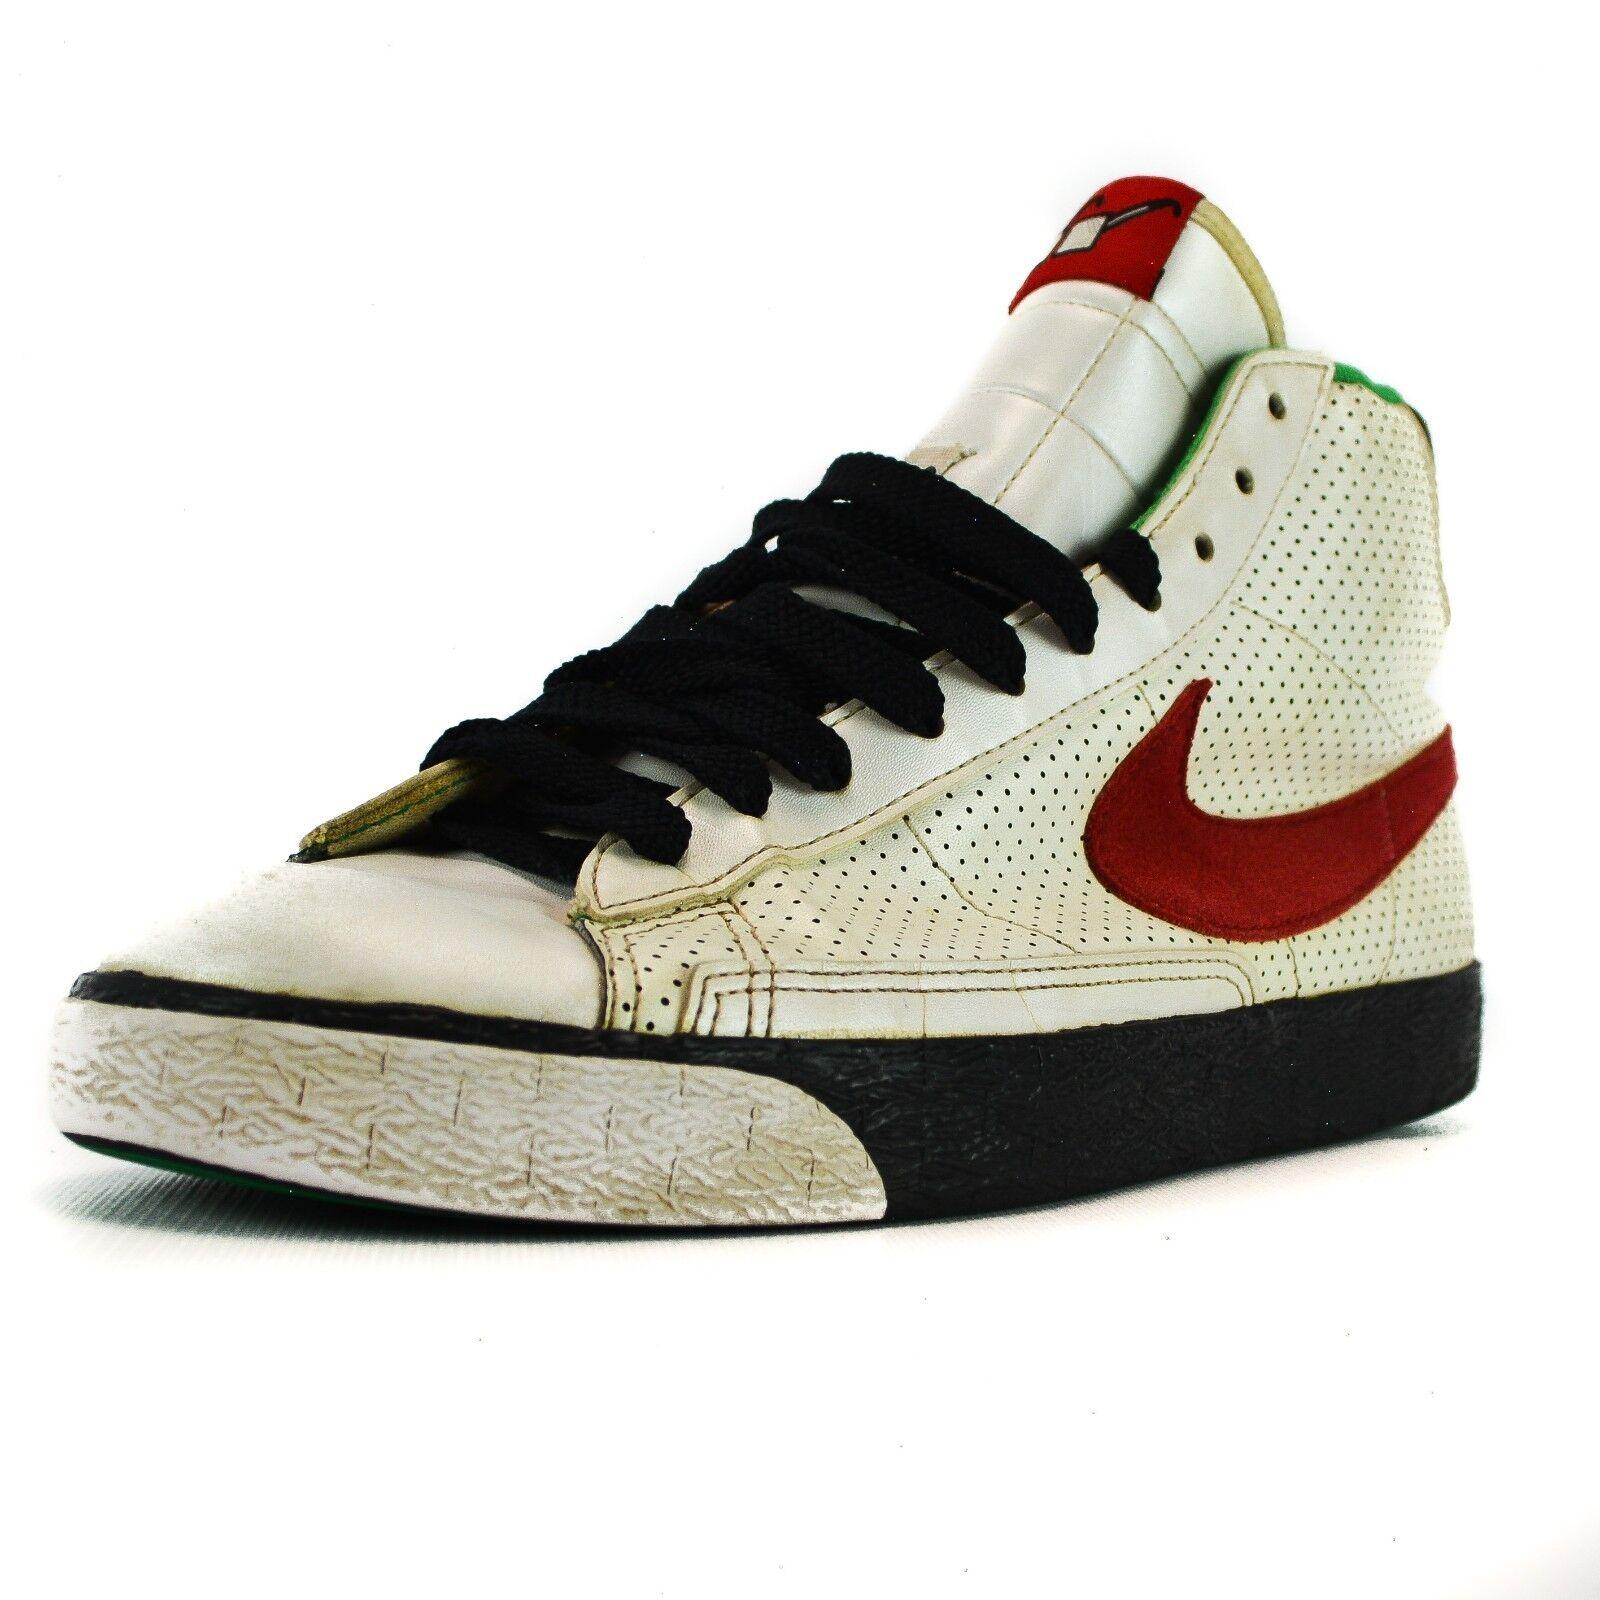 Nike Men's Blazer High BROOKLYN Beet Black Red Green 316664-161 Size 9